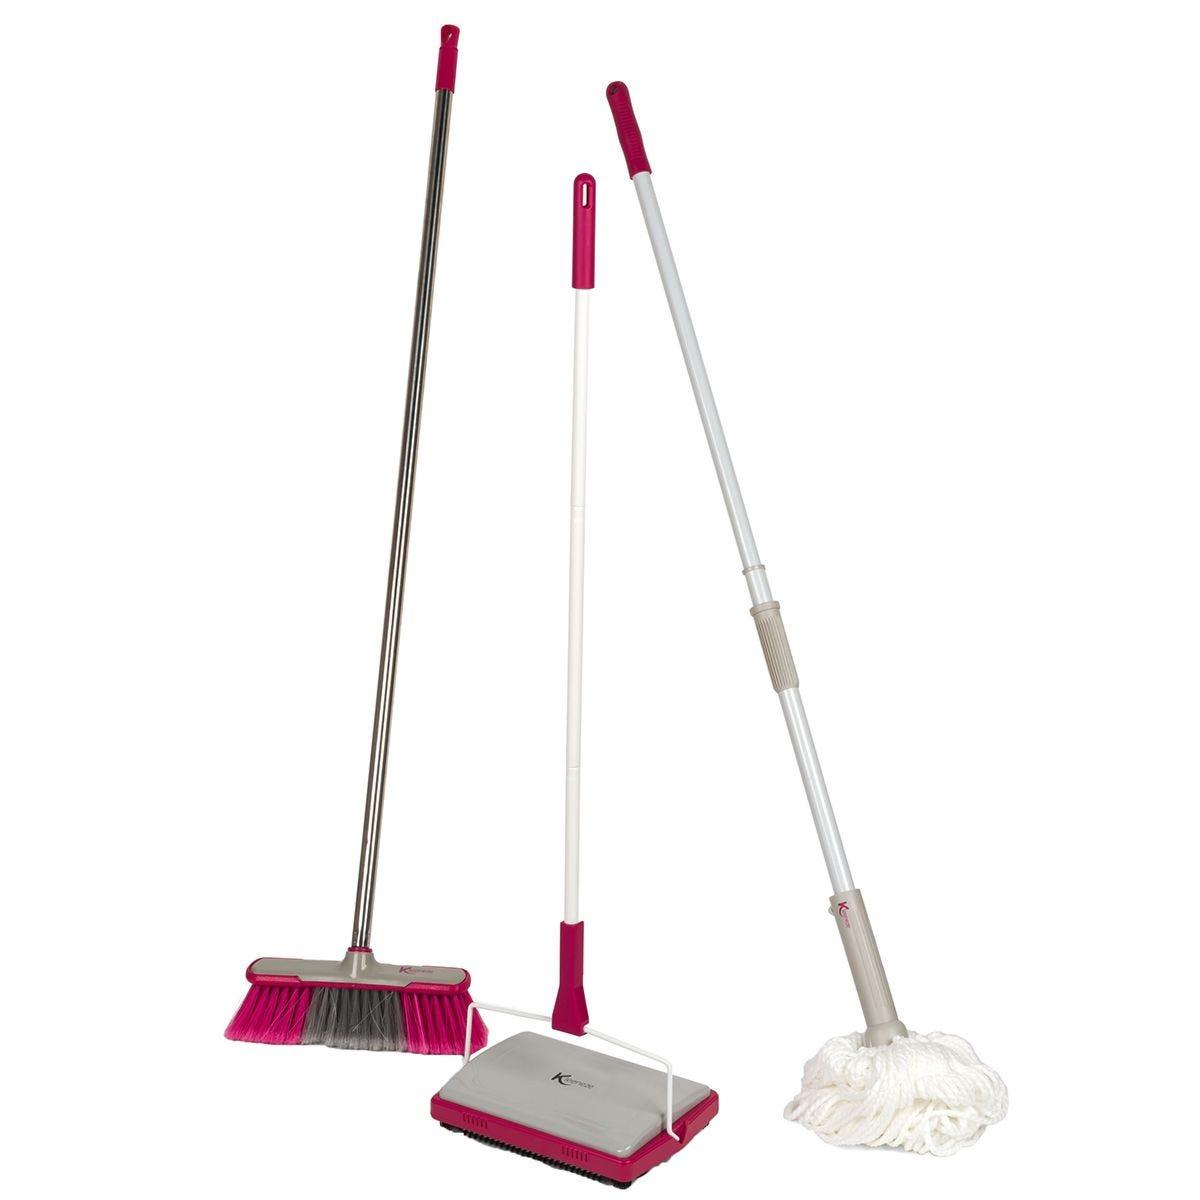 Kleeneze Soft Bristle Broom Carpet Sweeper & Extendable Twist Mop